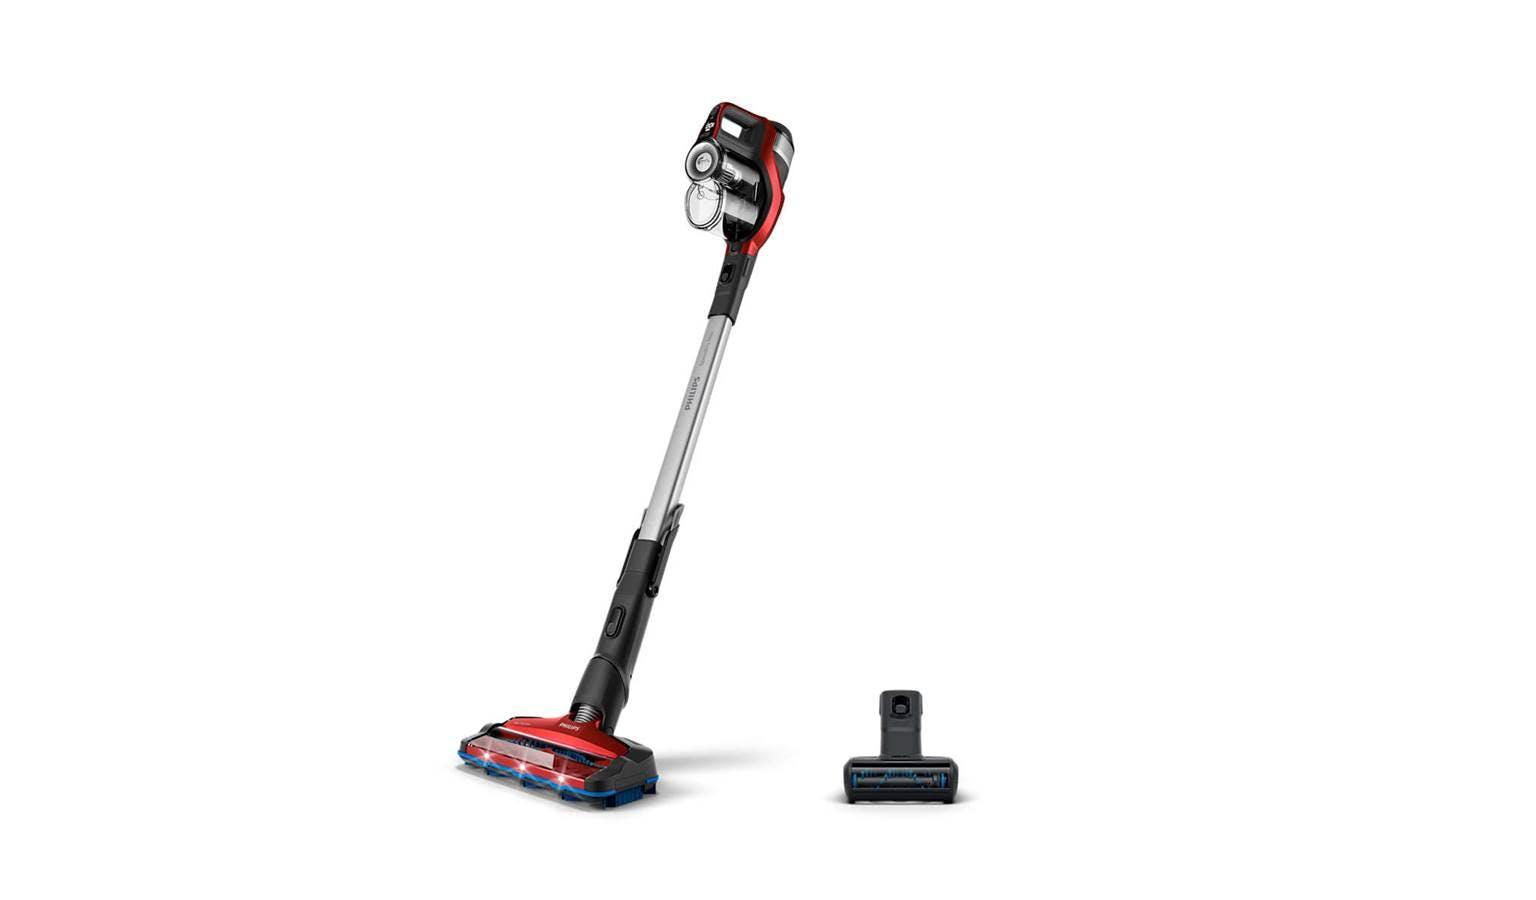 Philips Speedpro Max Stick Cordless Vacuum Cleaner